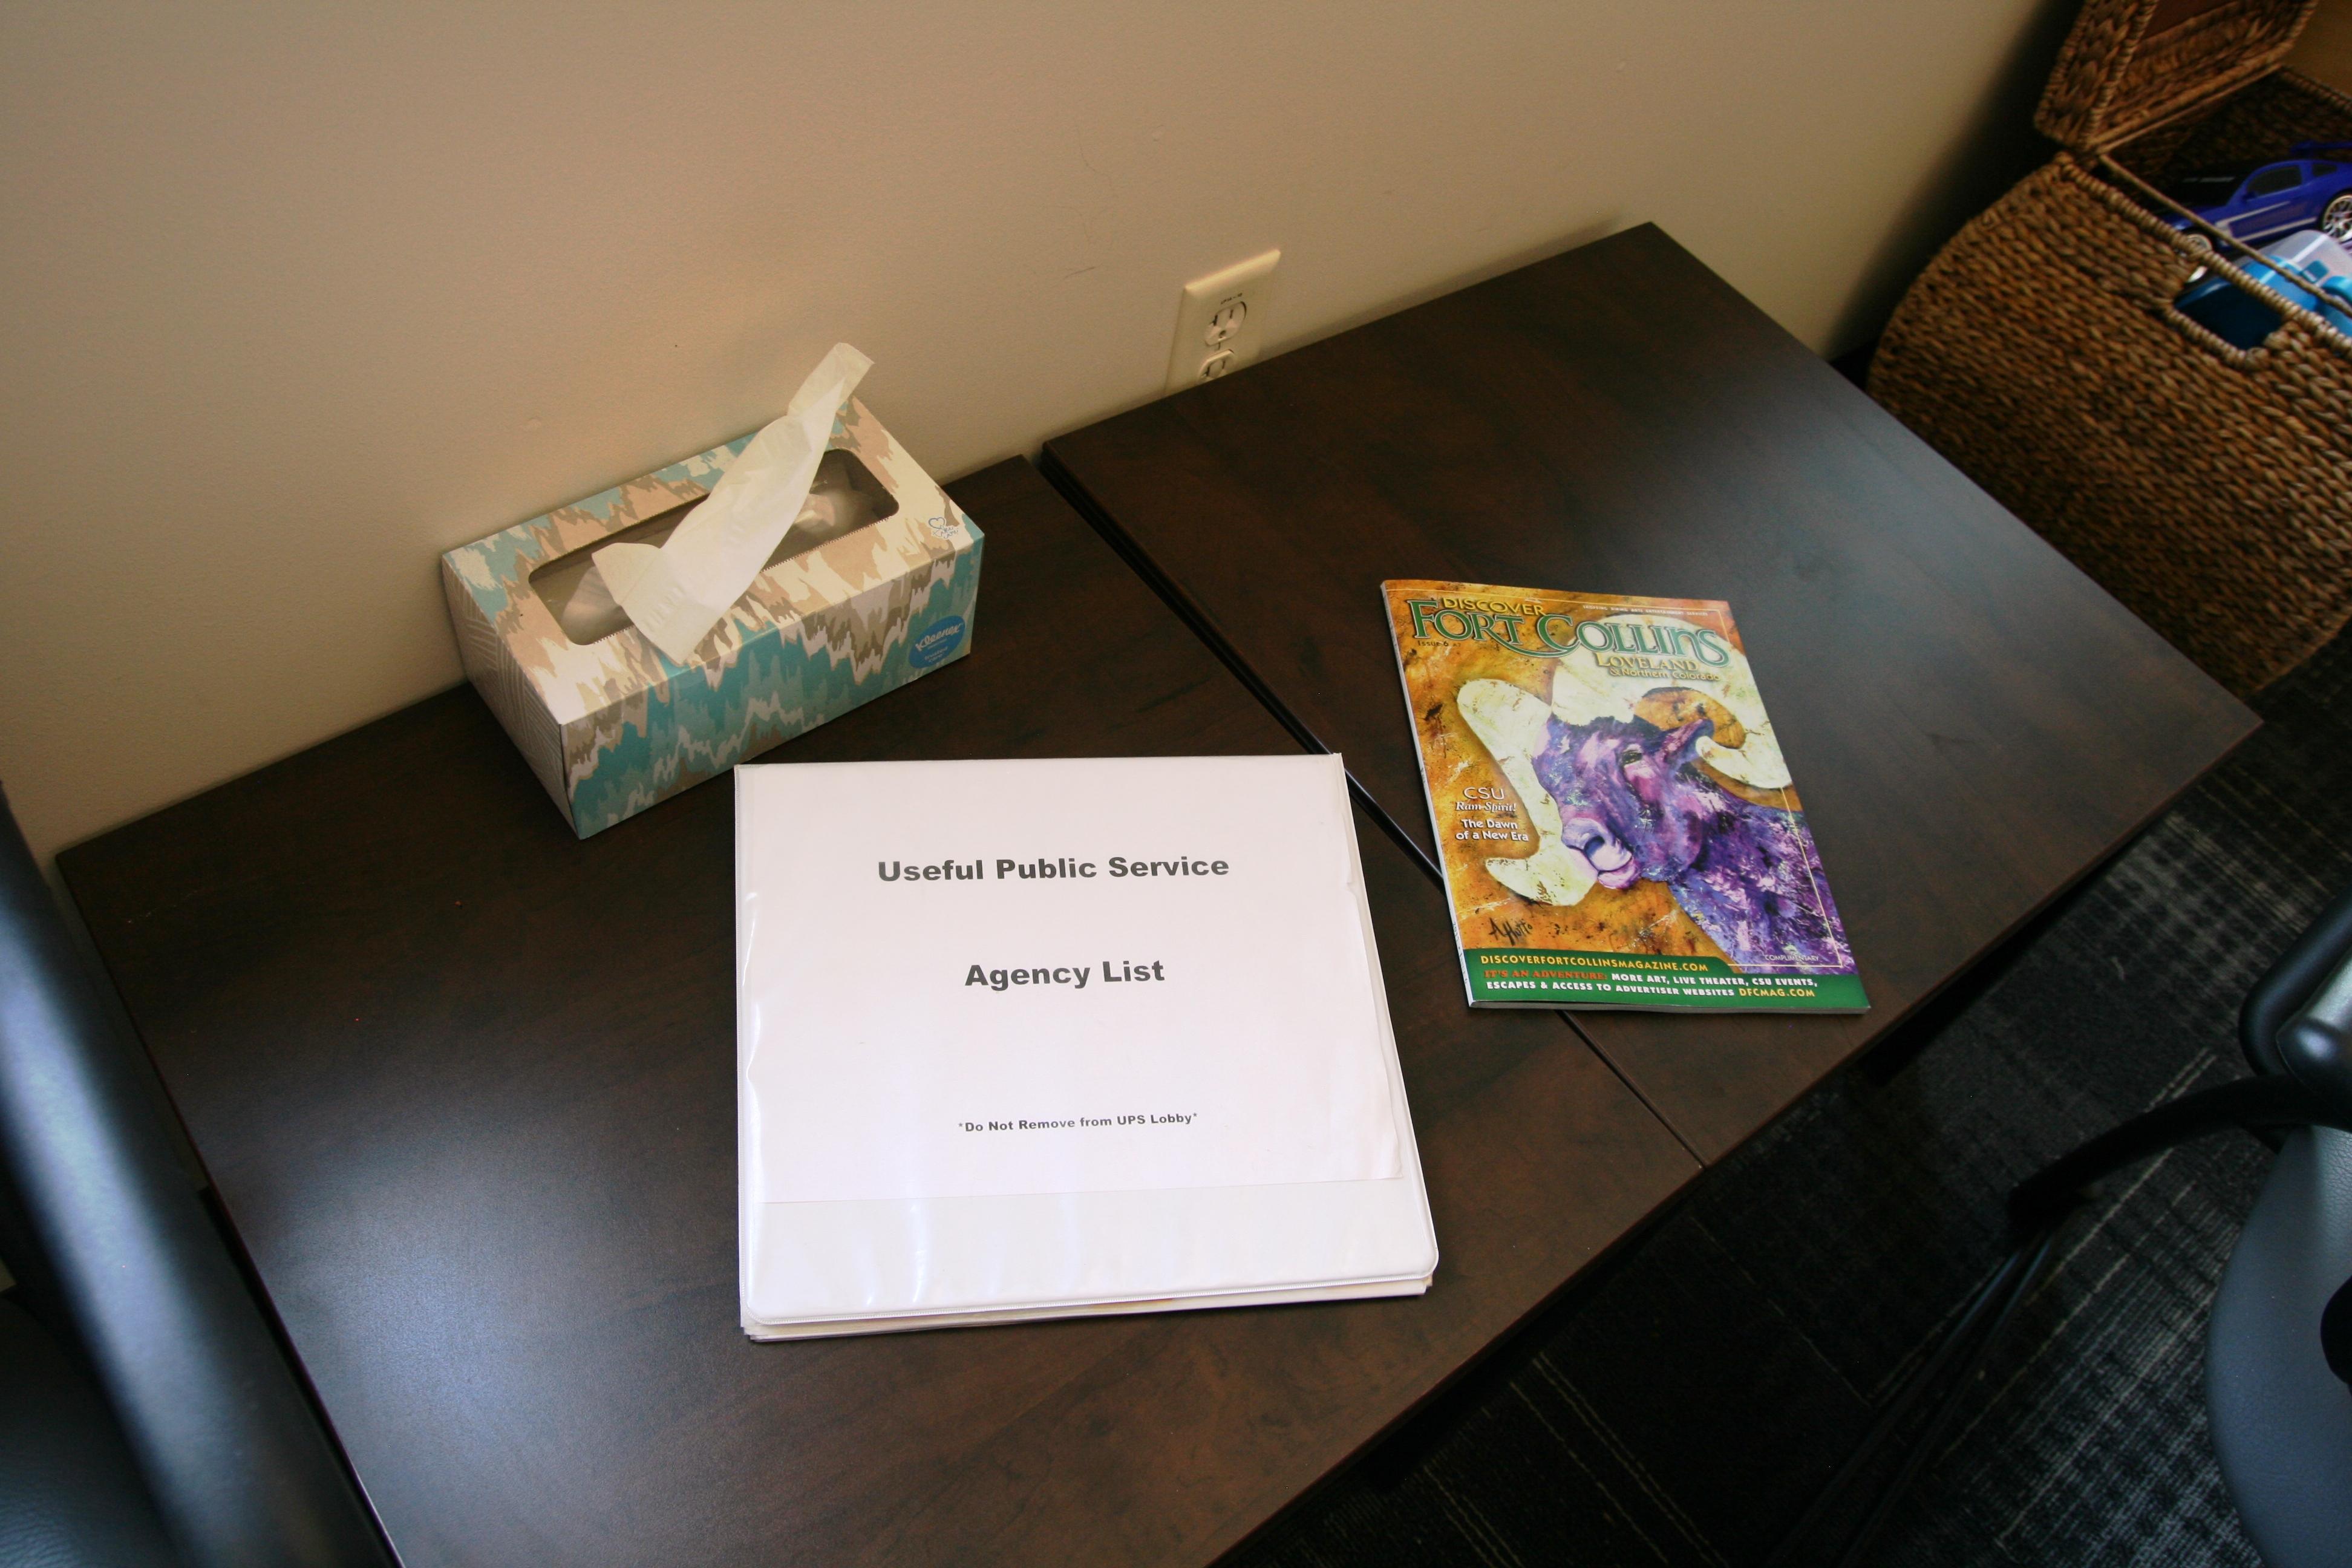 Imagen 3: Lista de agencias para servicio comunitario